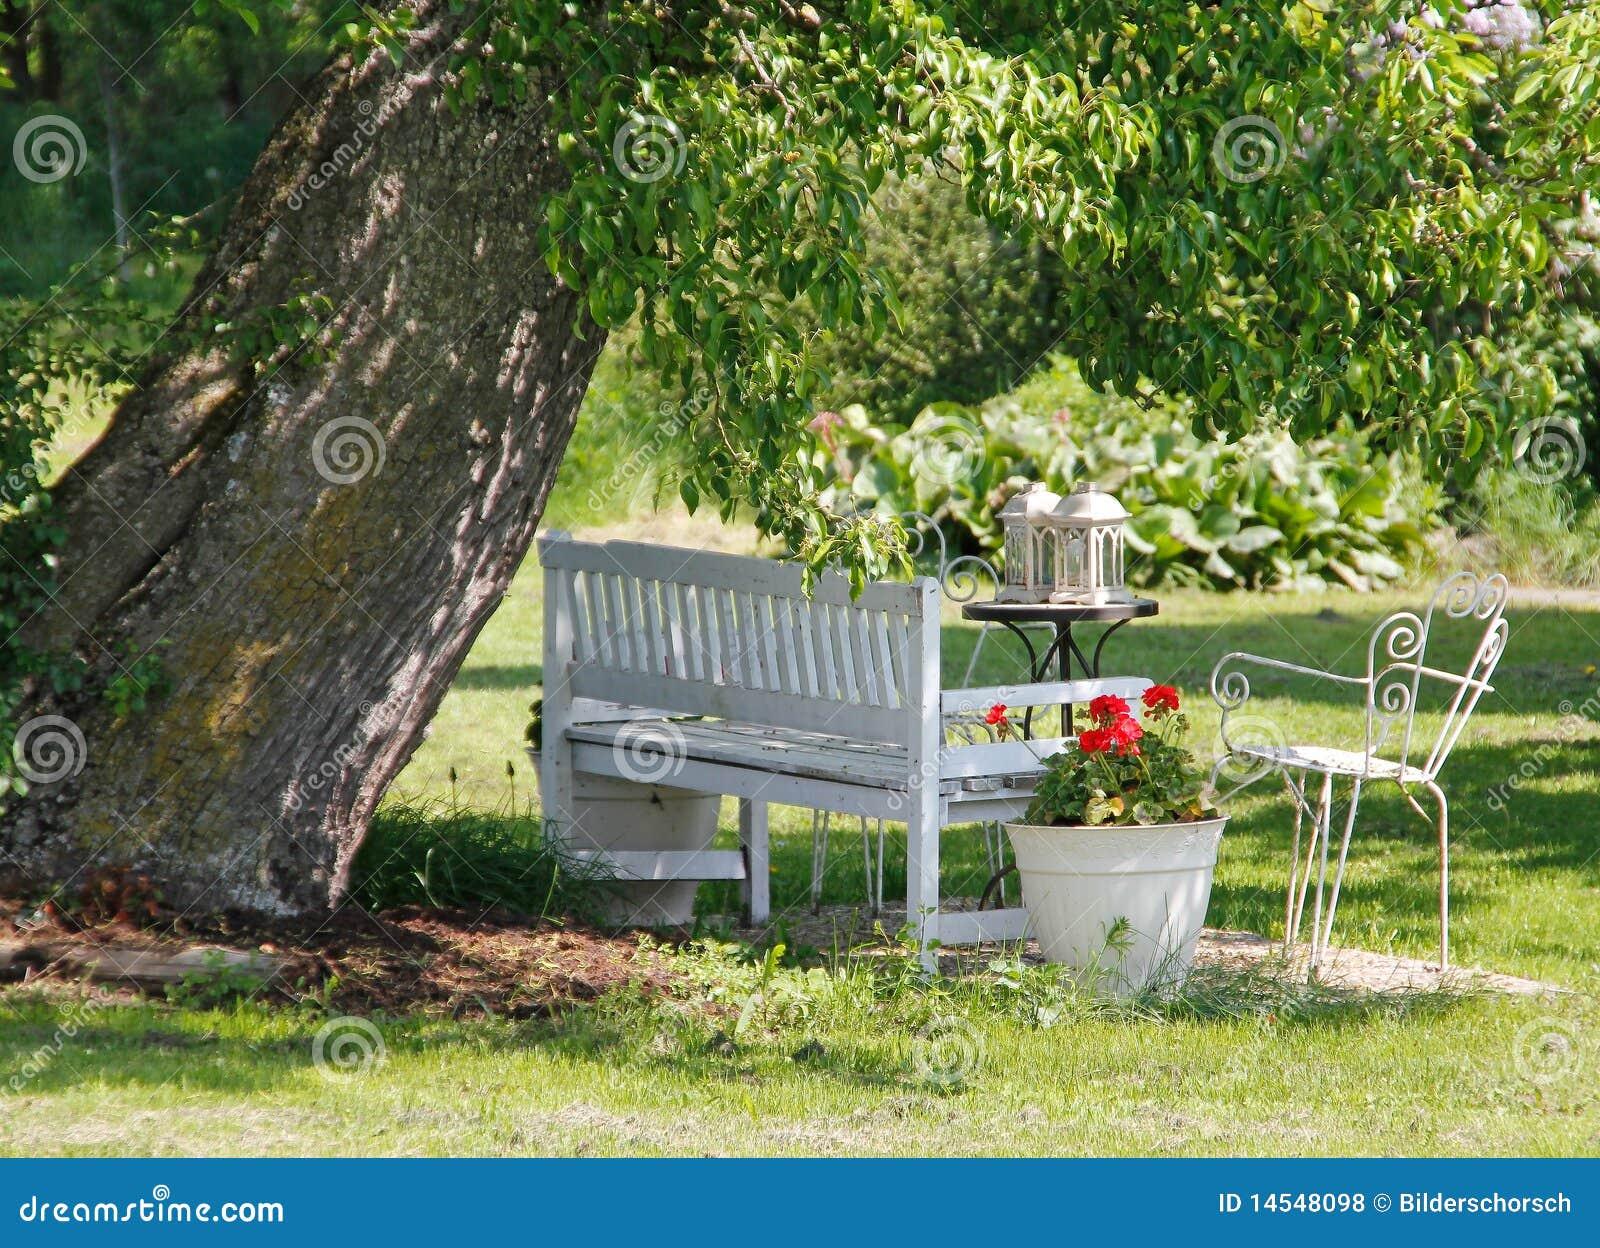 Jardimbanco Fotos de Stock Royalty Free  Imagem 14548098